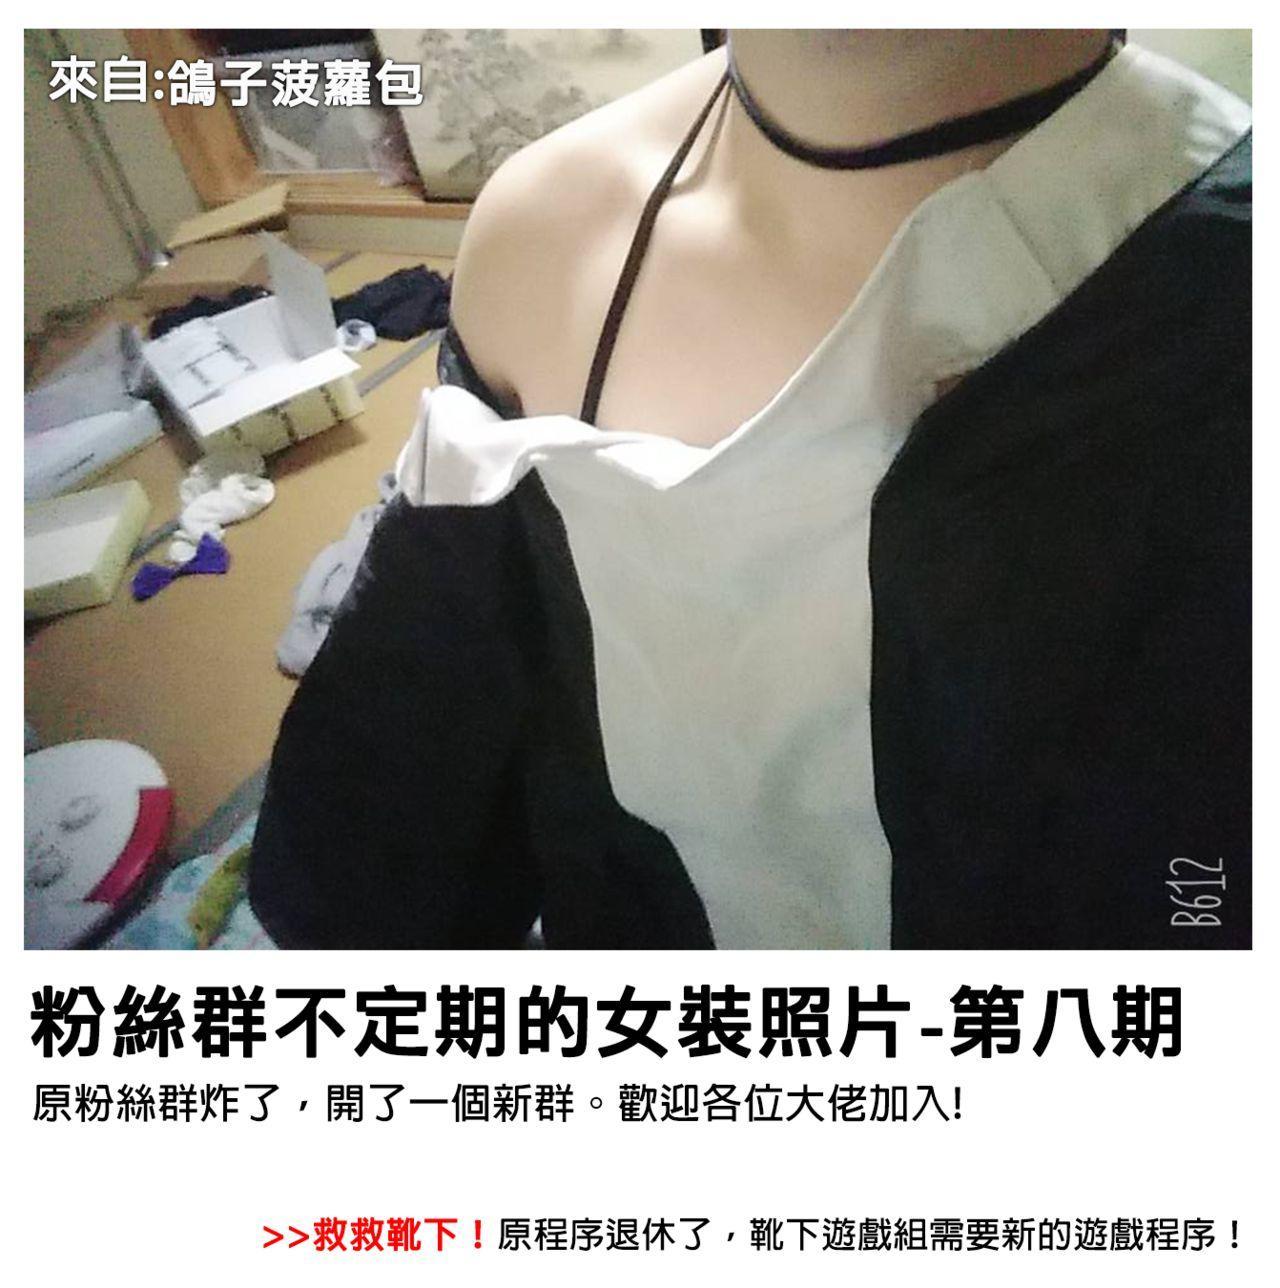 [Mitarashidou (Ikemura Hiroichi)] P no Idol Kyouiku Shidou 3 - ShibuRin Hen (Chuukyuu Stretch)   P的偶像教育指导3 - 涩谷凛篇(中级难度体操篇) (THE IDOLM@STER CINDERELLA GIRLS) [Chinese] [靴下汉化组] [Digital] 32